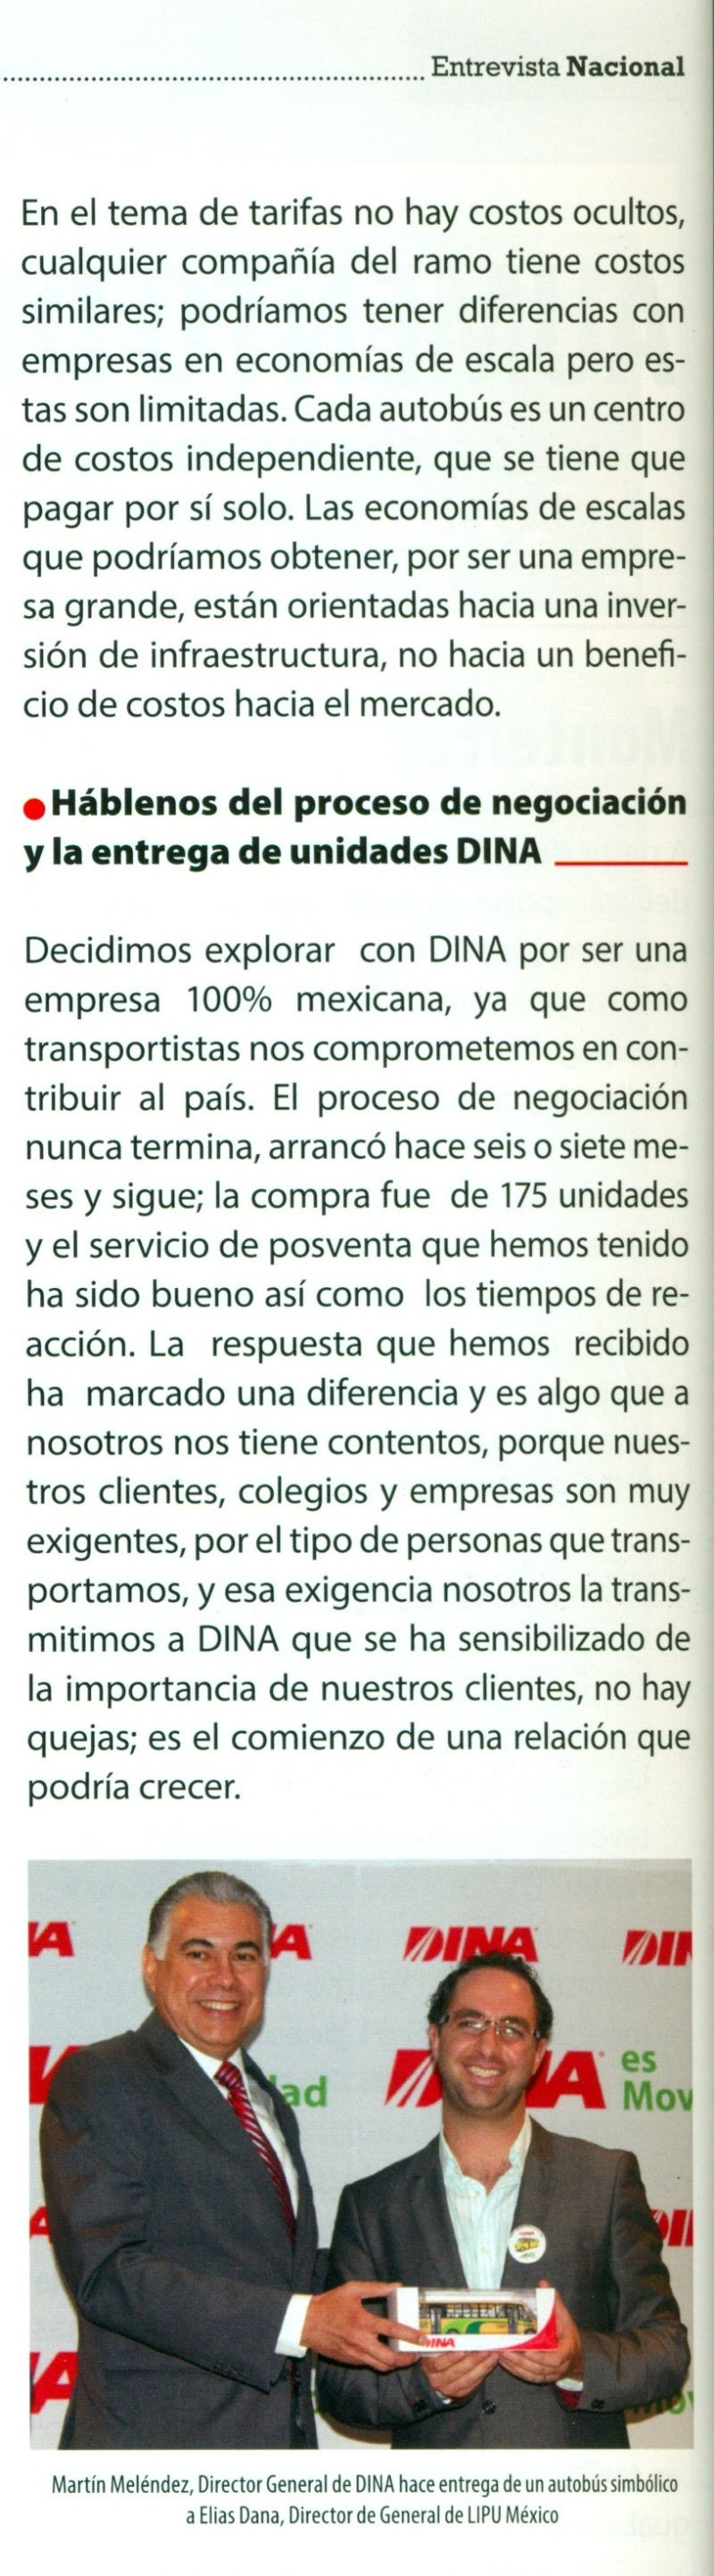 Revista %22Pasajero 7%22 Febrero 2014 Pag. 11A